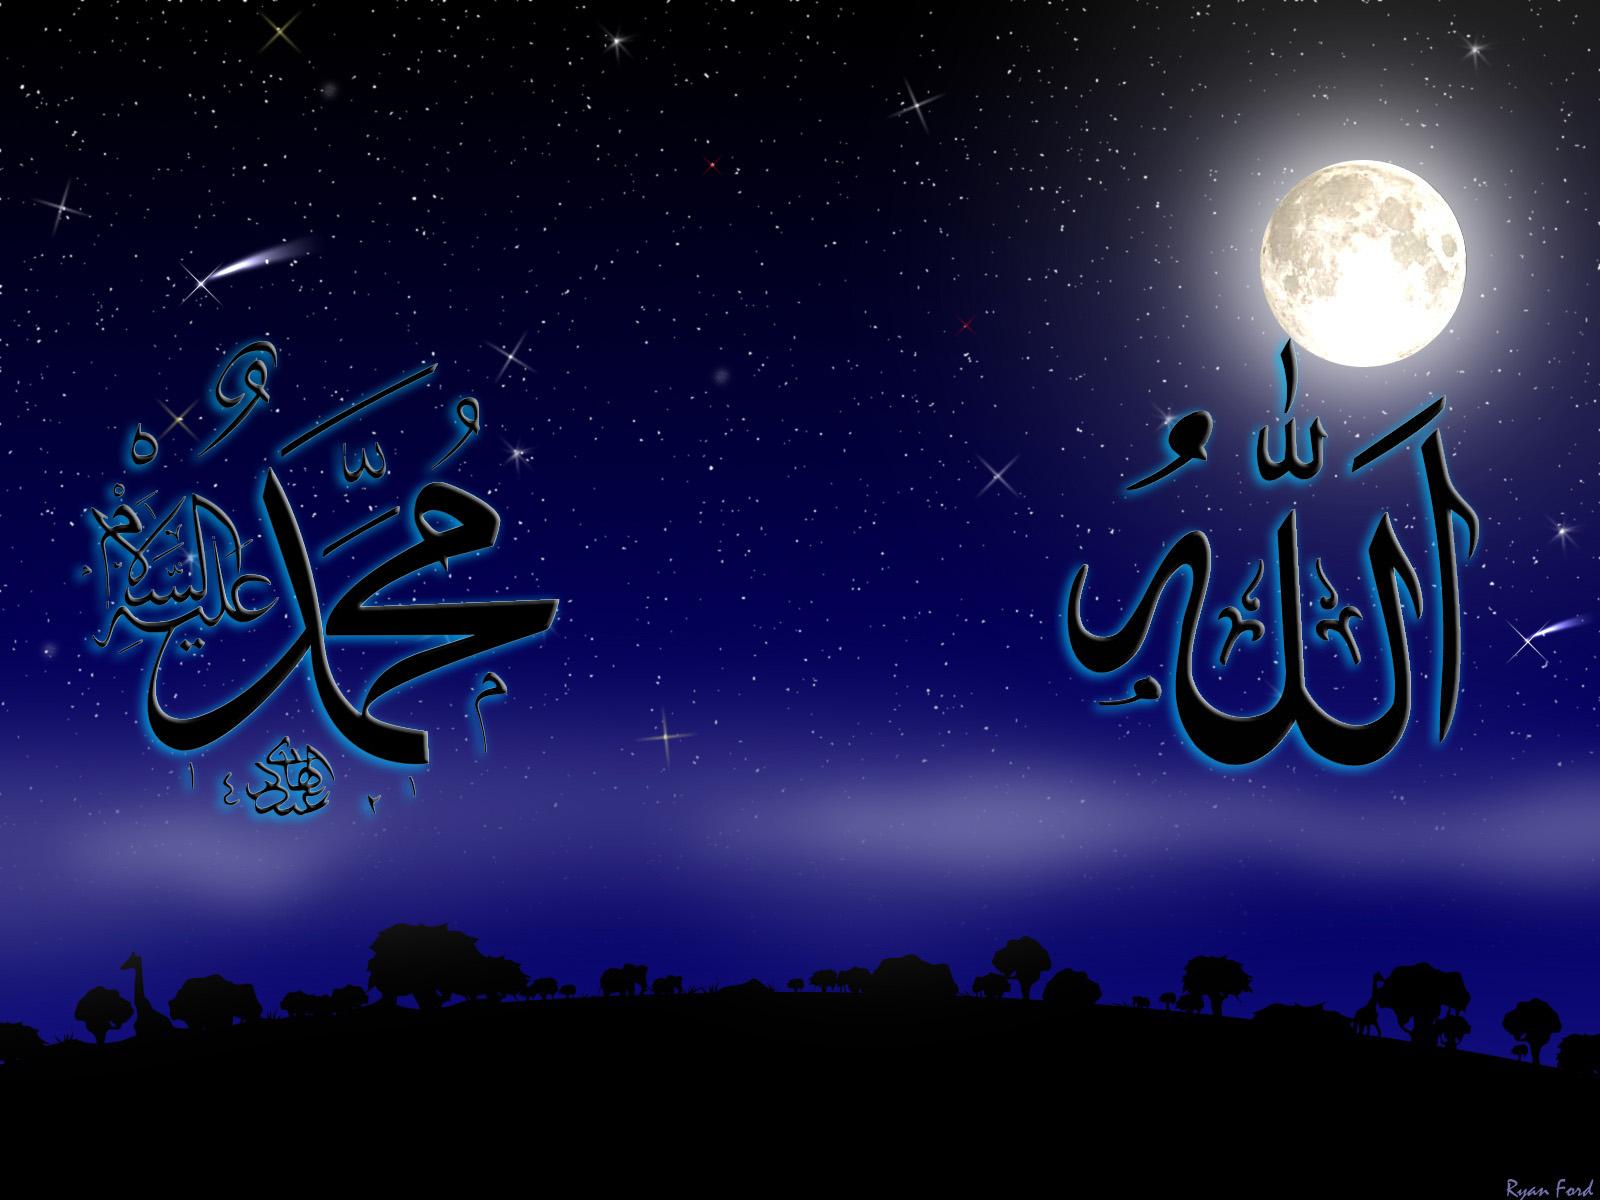 http://1.bp.blogspot.com/_GtN5NslLggw/S8_EmZ4yUSI/AAAAAAAABCE/ovQaQc50np0/s1600/Allah+will+always+be+there.jpg